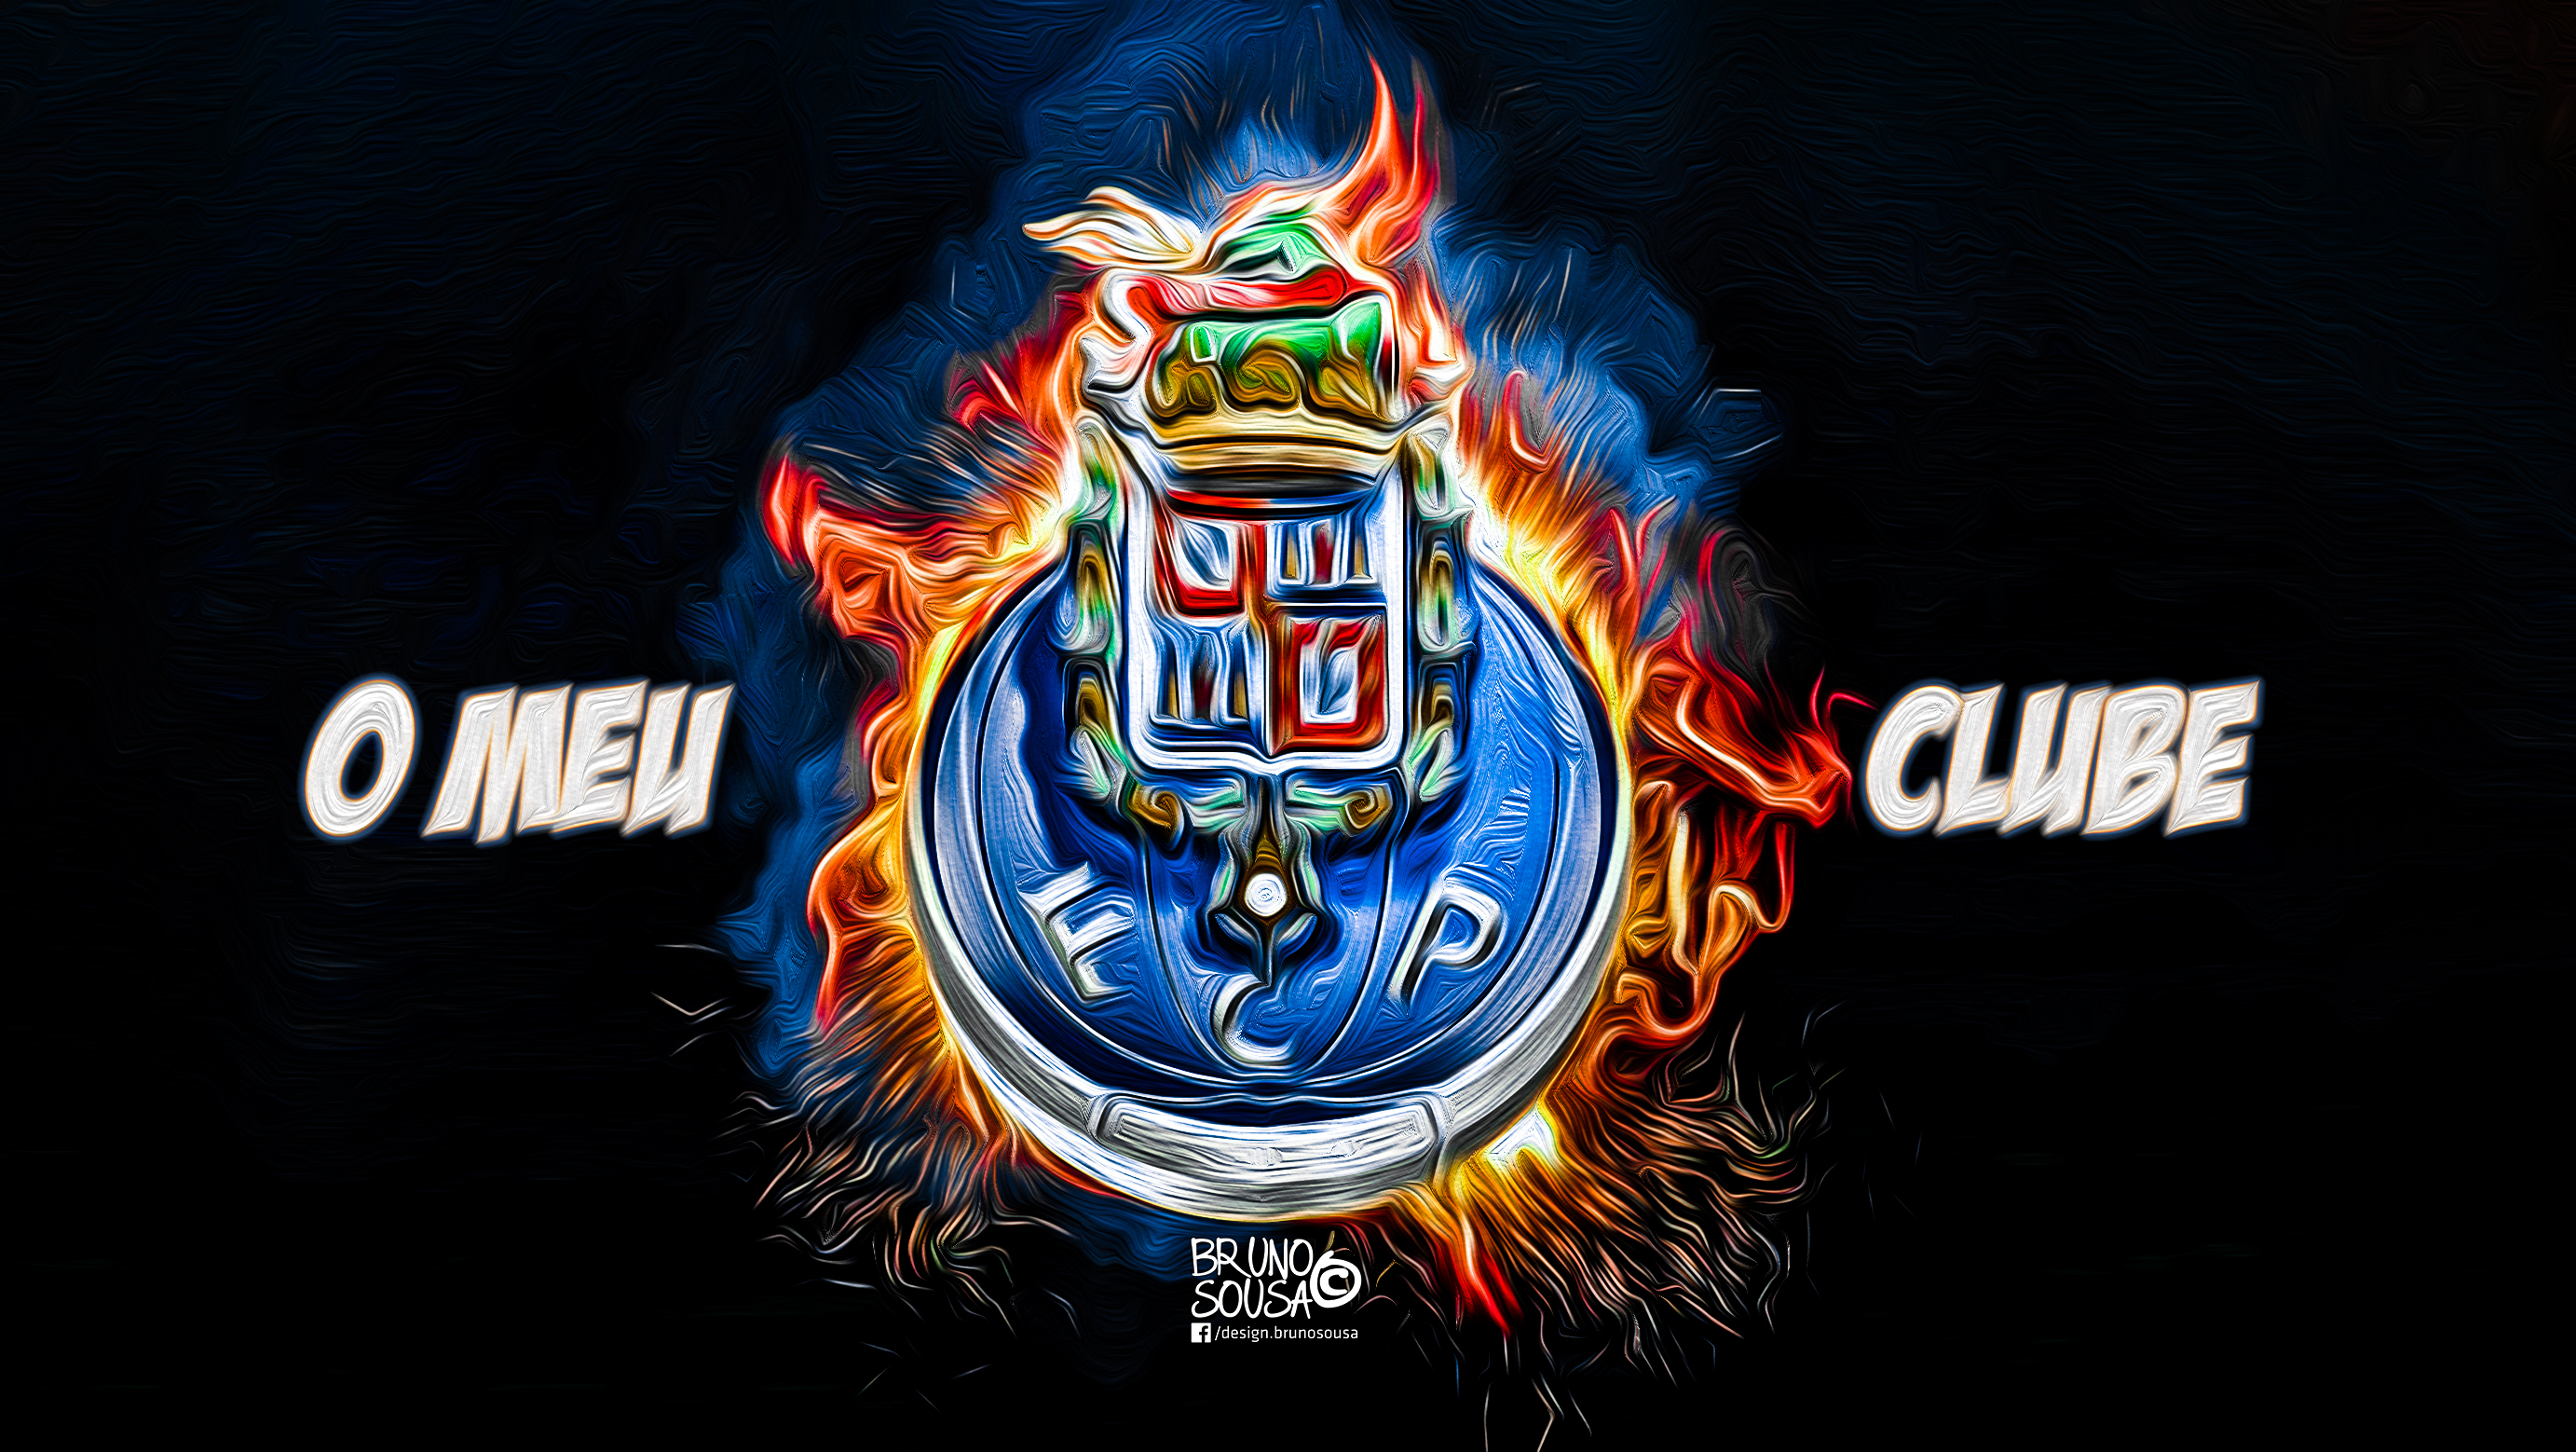 FC Porto Wallpaper 12   2765 X 1558 stmednet 2765x1558